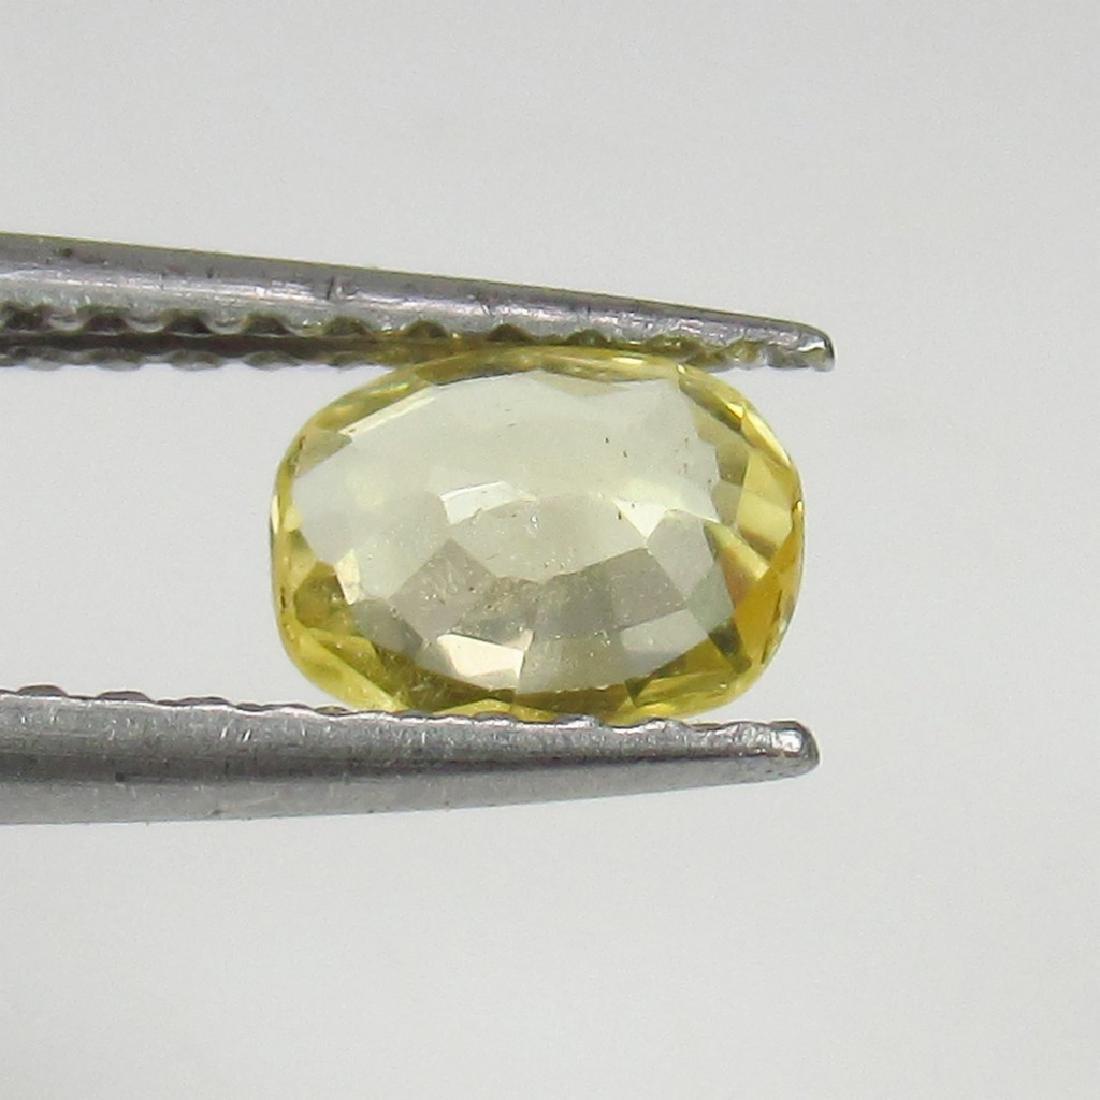 0.63 Ct Genuine Ceylon Yellow Sapphire Top Class Luster - 2